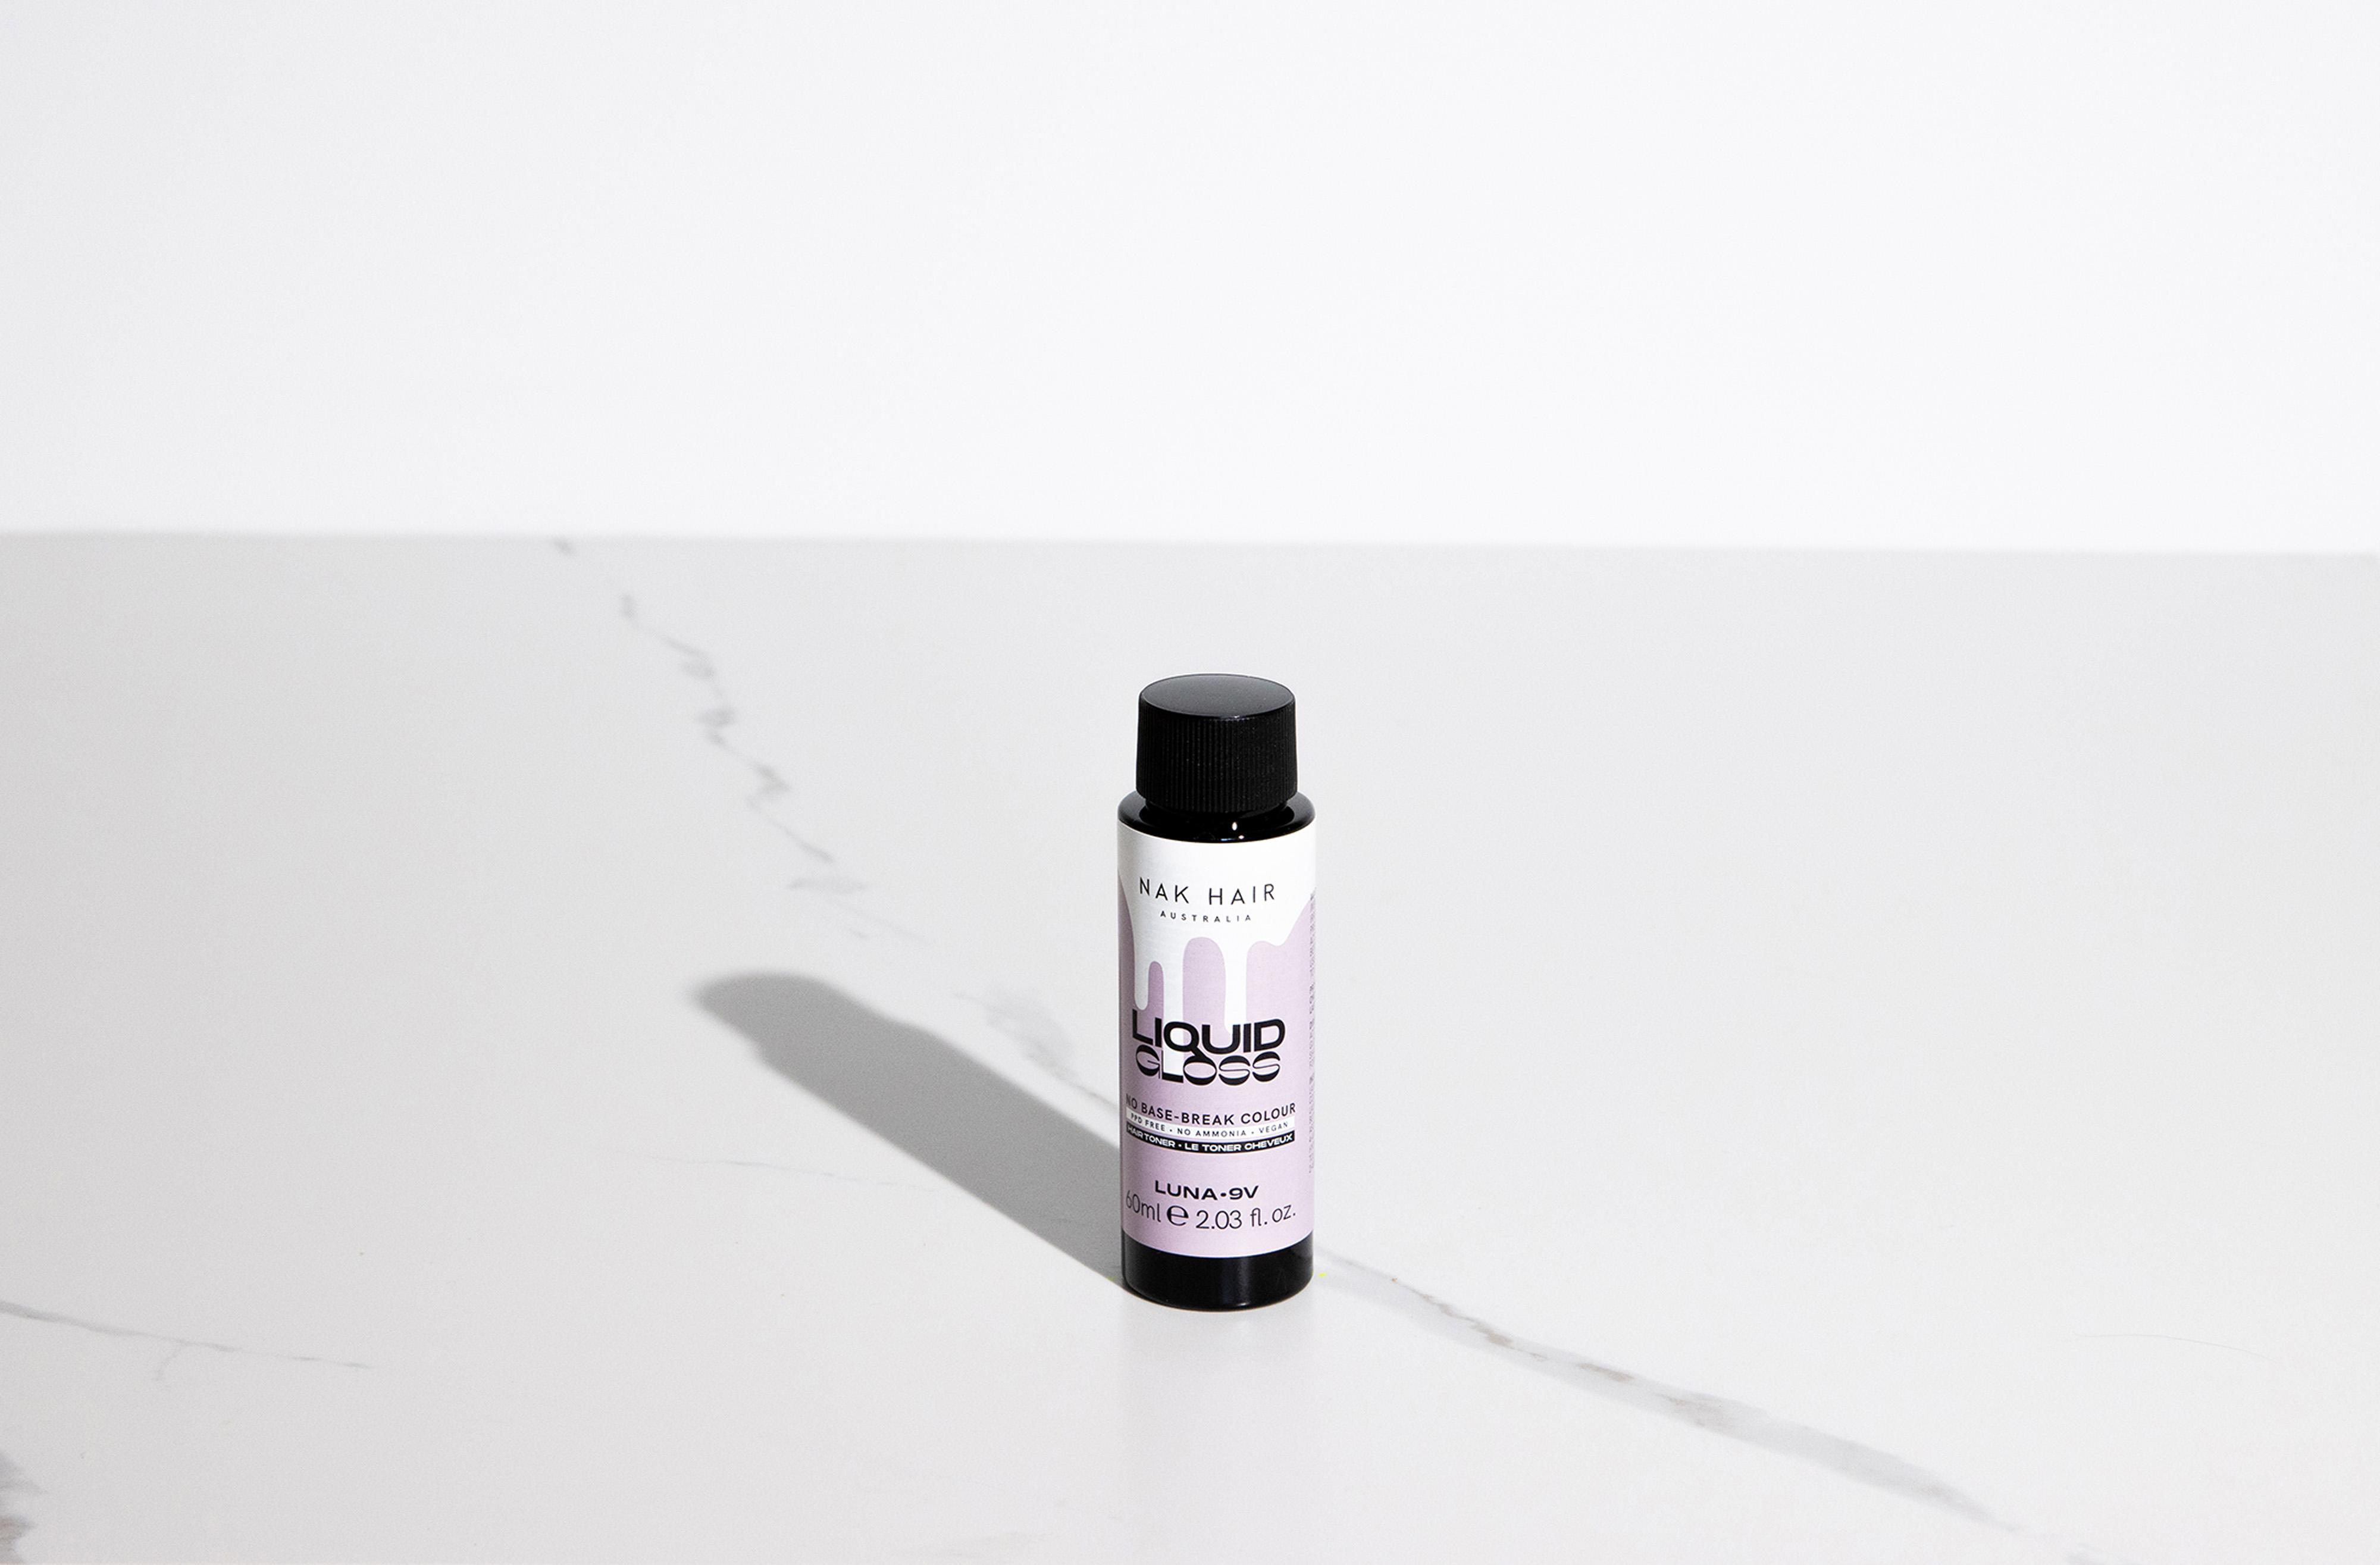 NAK Liquid Gloss Luna 60ml